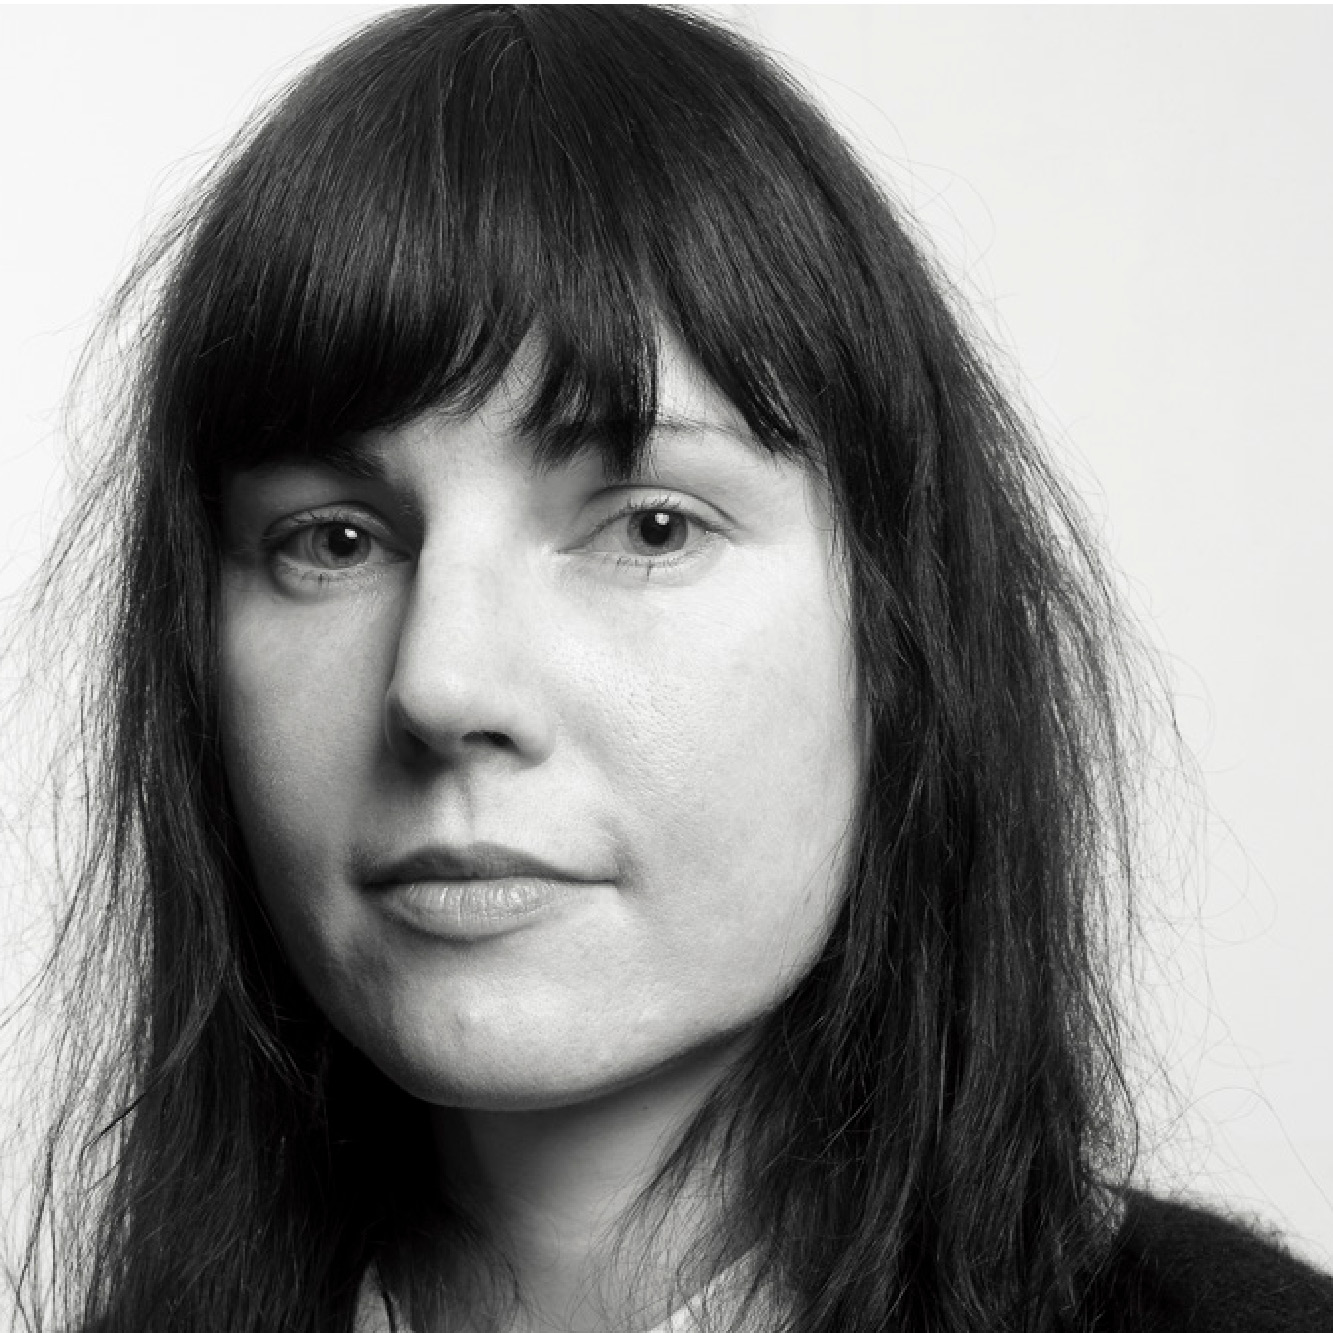 Maria Dorothea Schrattenholz